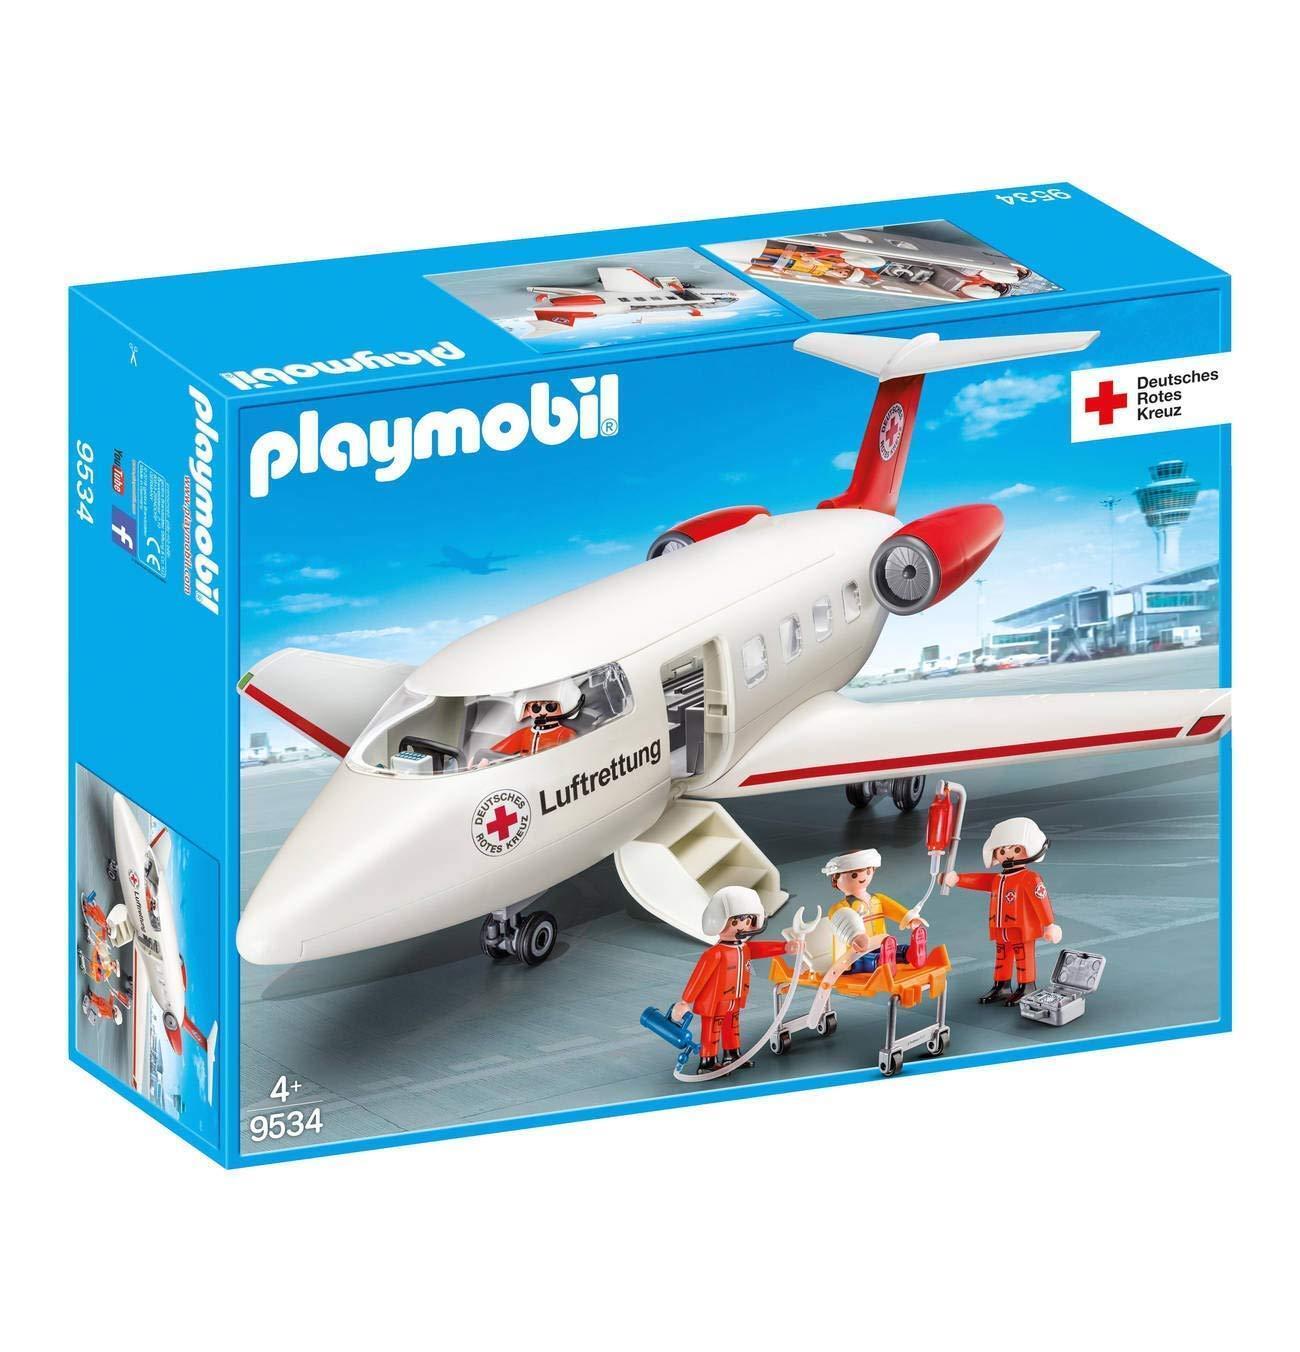 Playmobil - Deutsches Rotes Kreuz - 9534 - Rettungsflugzeug - NEU OVP